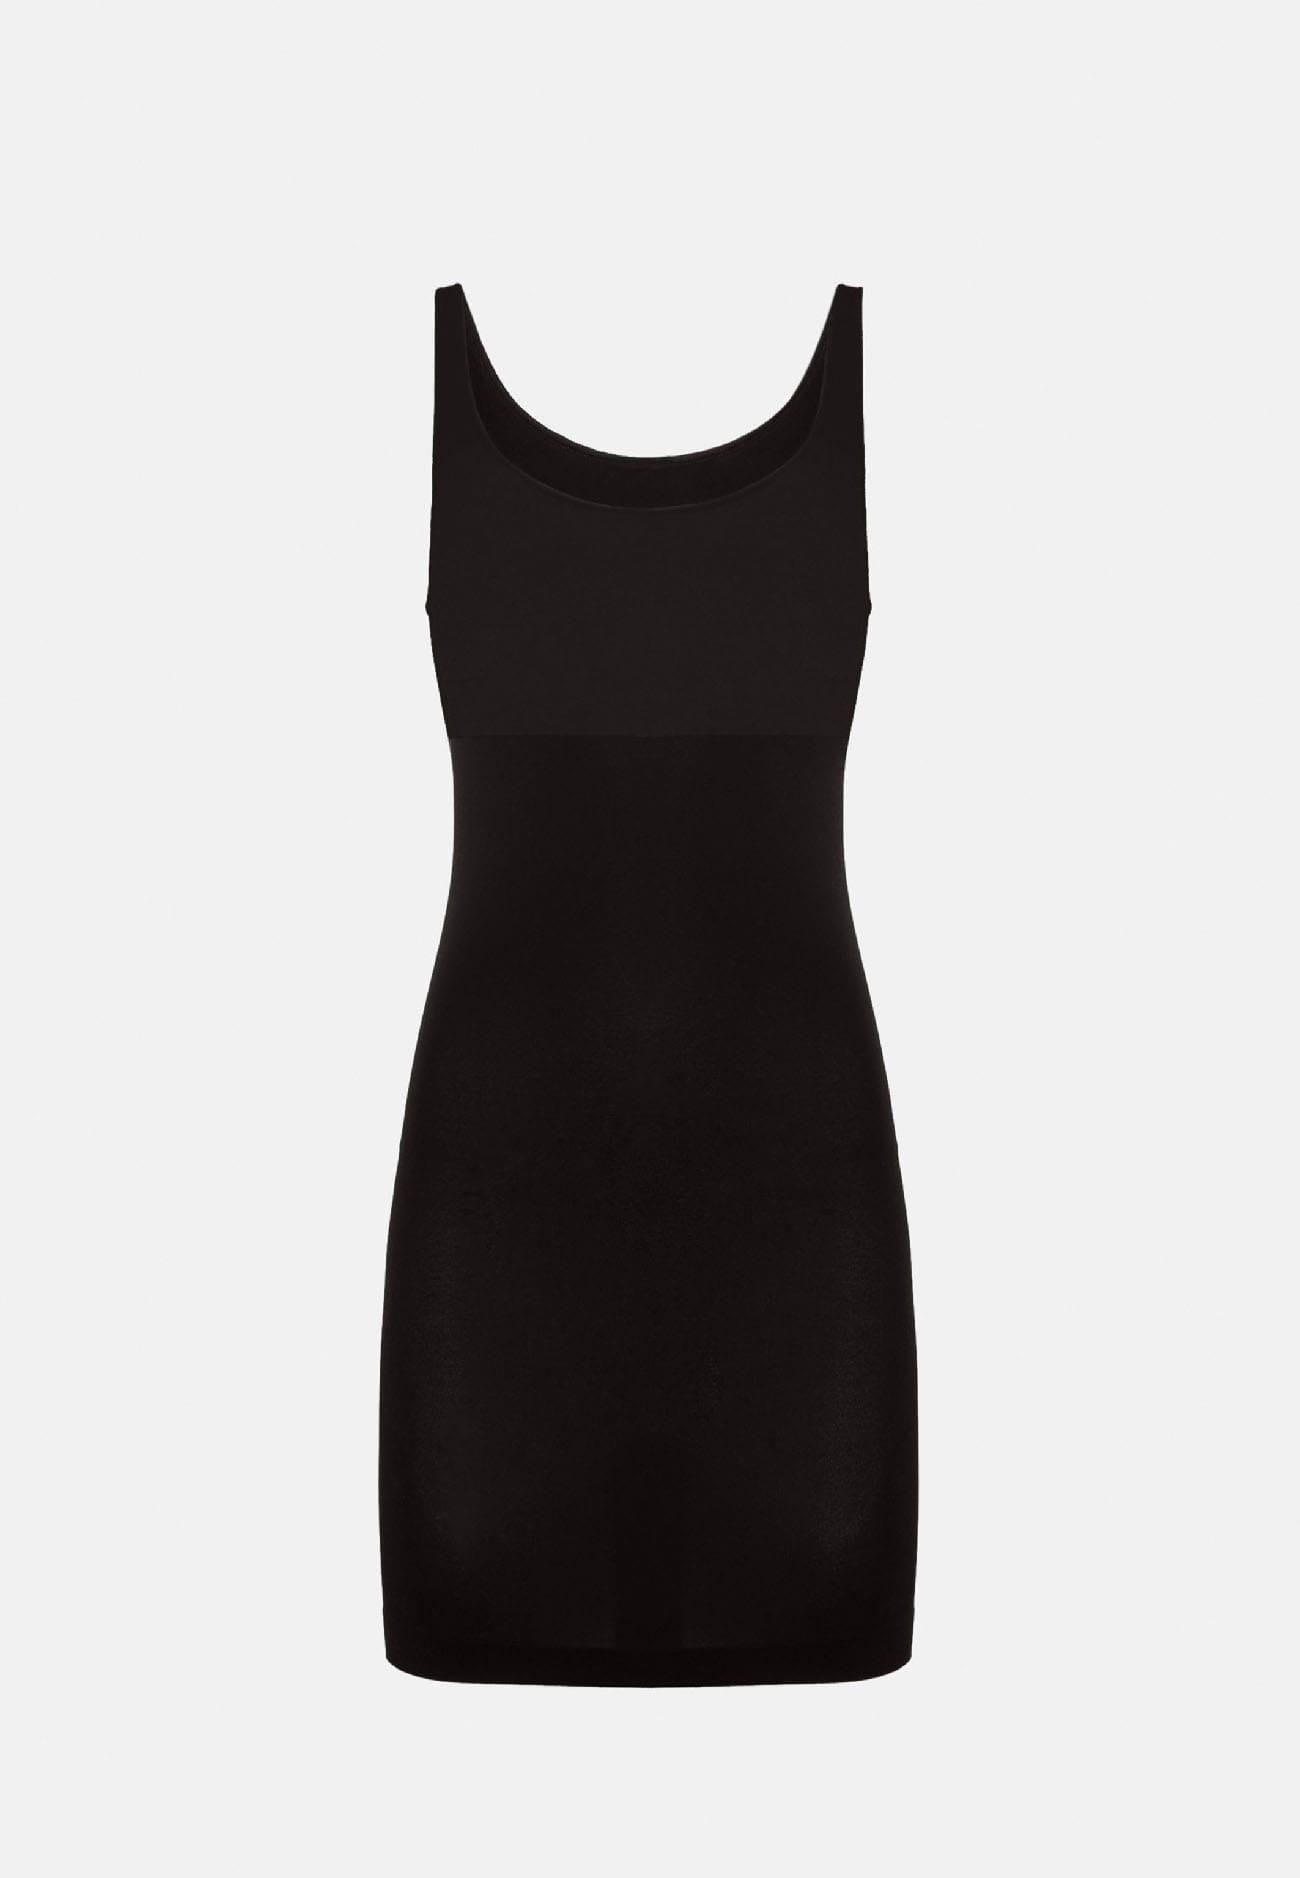 56045 Ind. Nat. Seamless Form. Dress